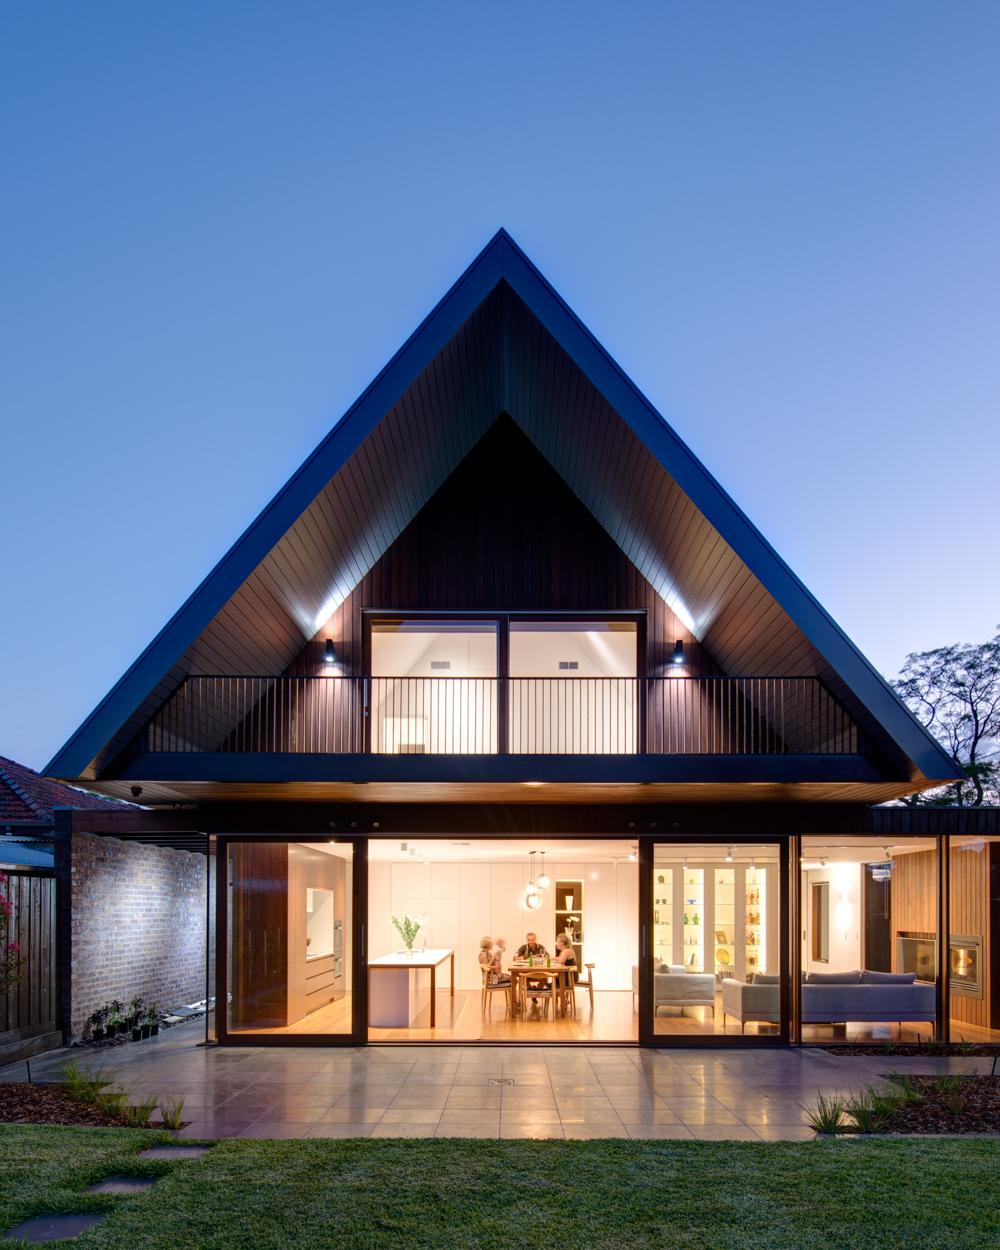 ford-street-house-chaulk-studio-the-design-emotive-02.jpg